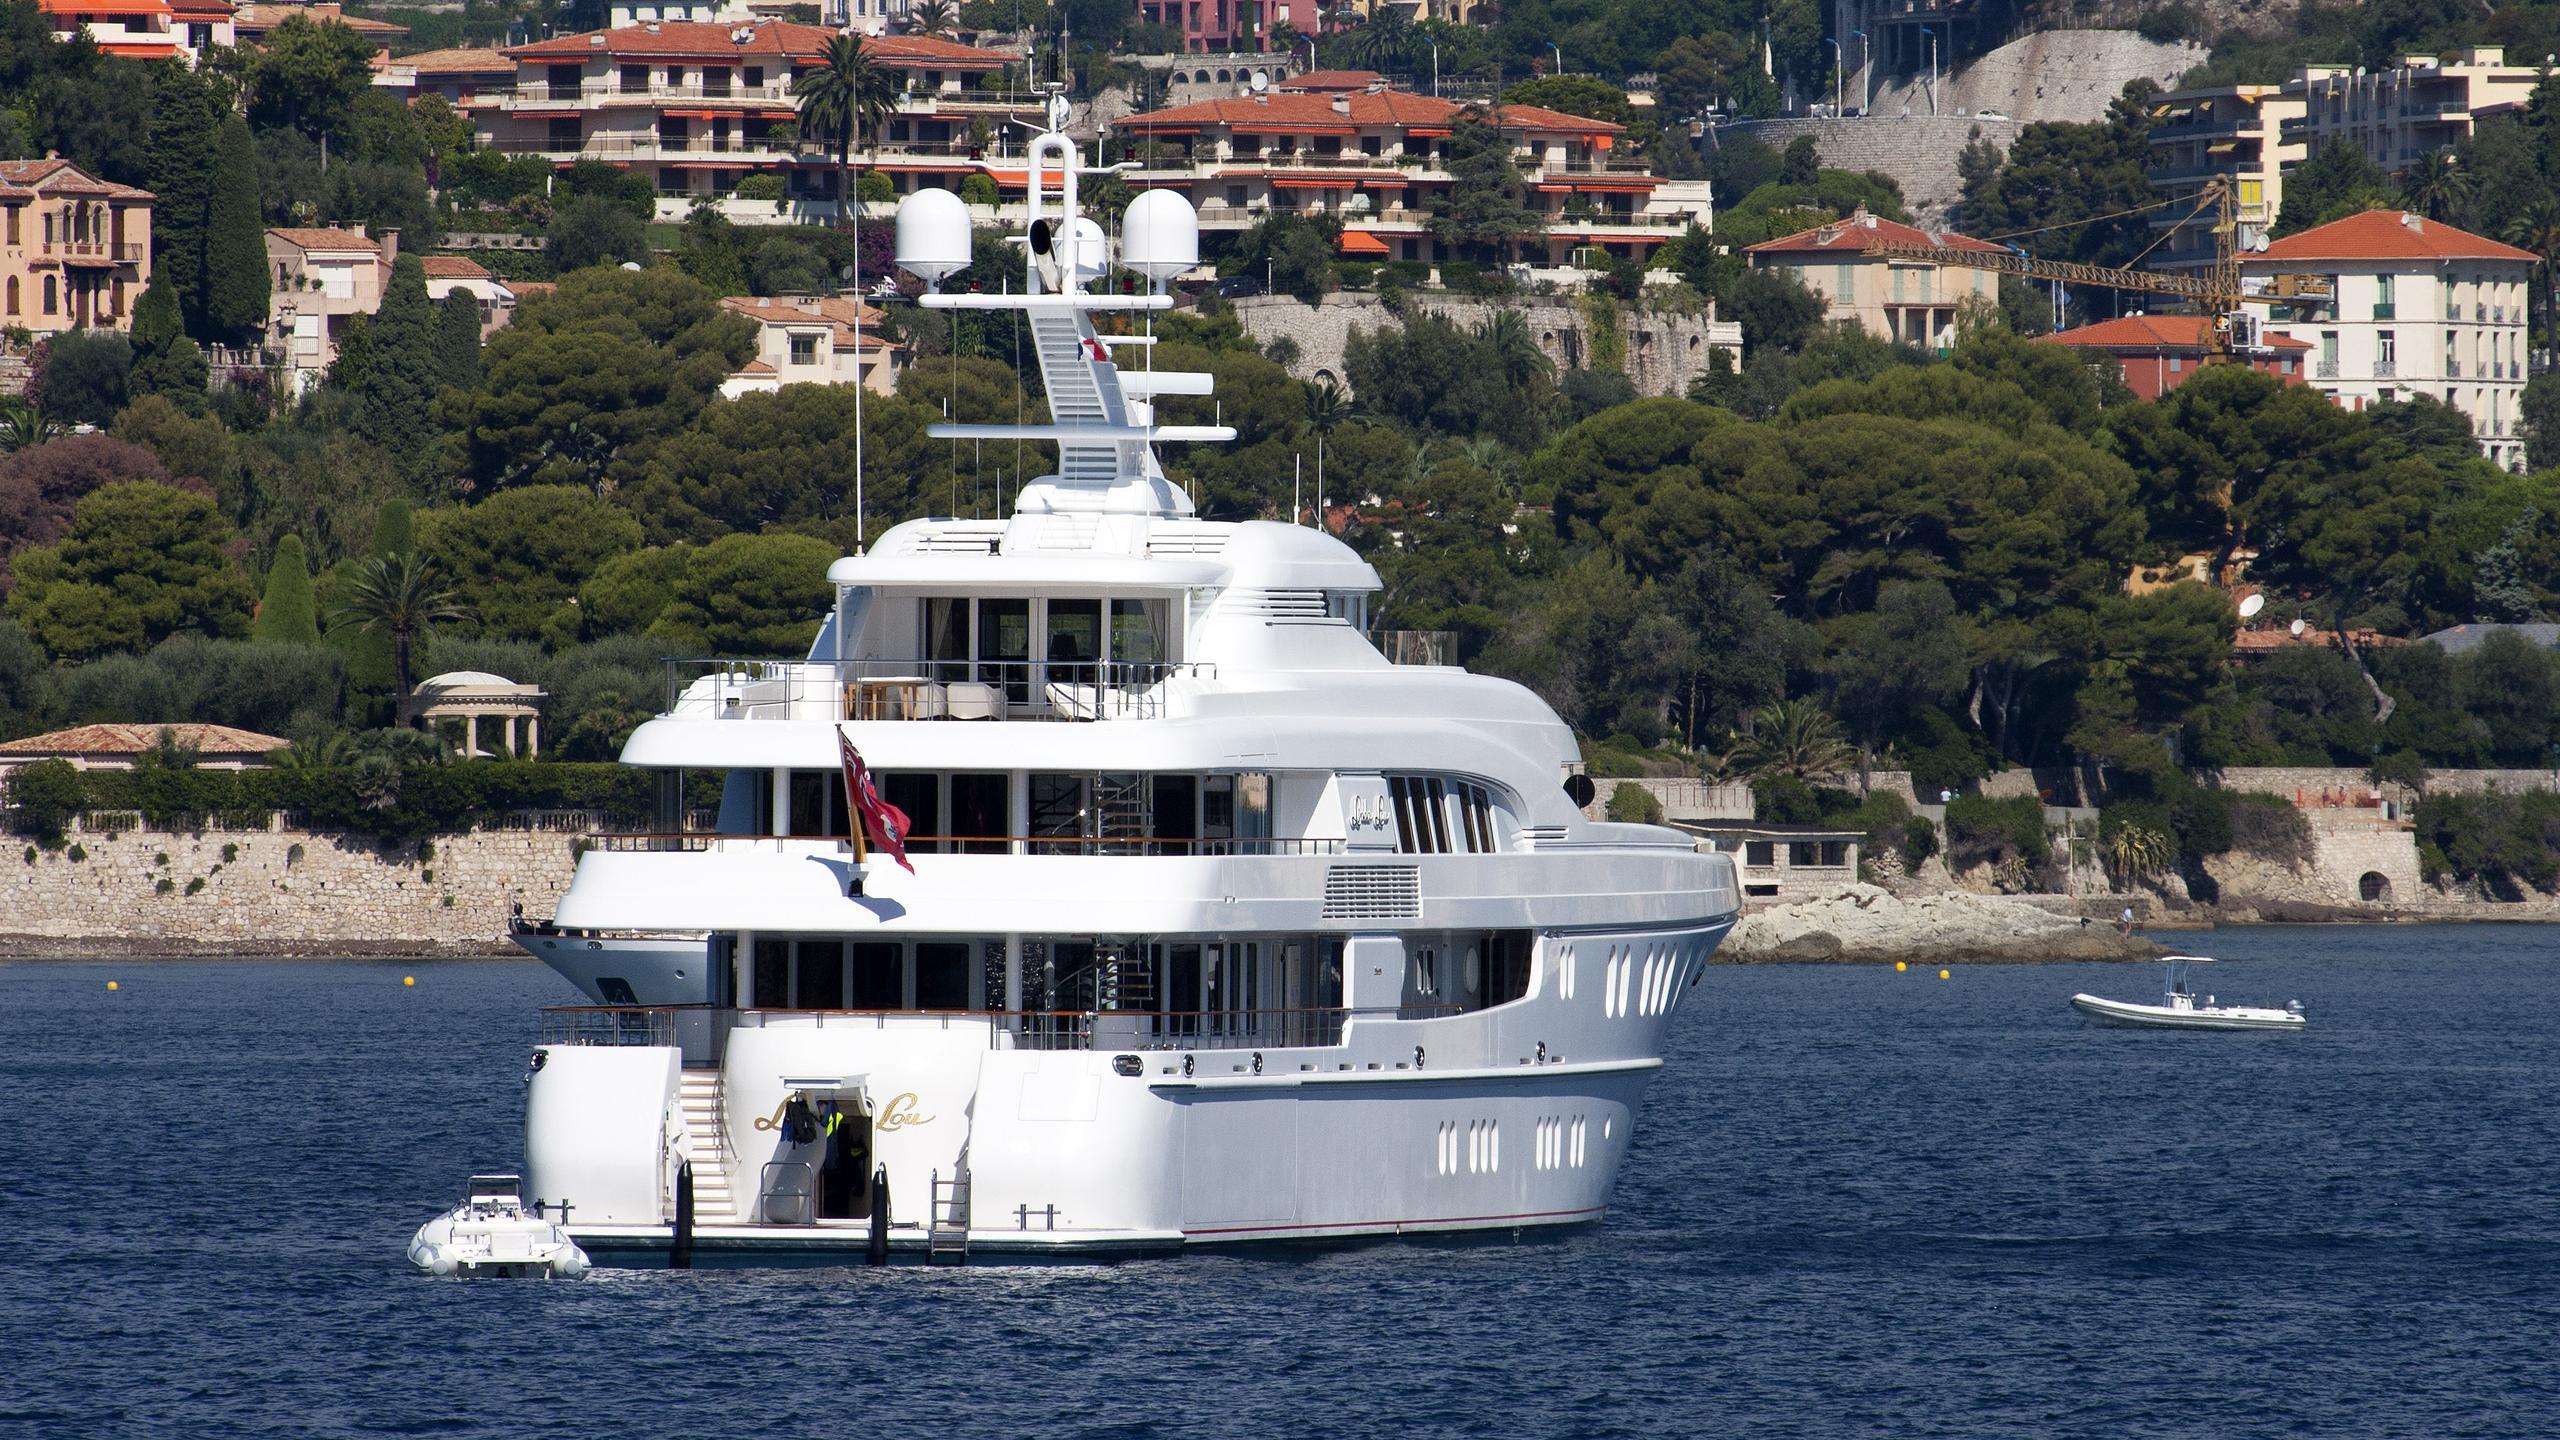 podium-motor-yacht-lurssen-2006-60m-stern-before-refit